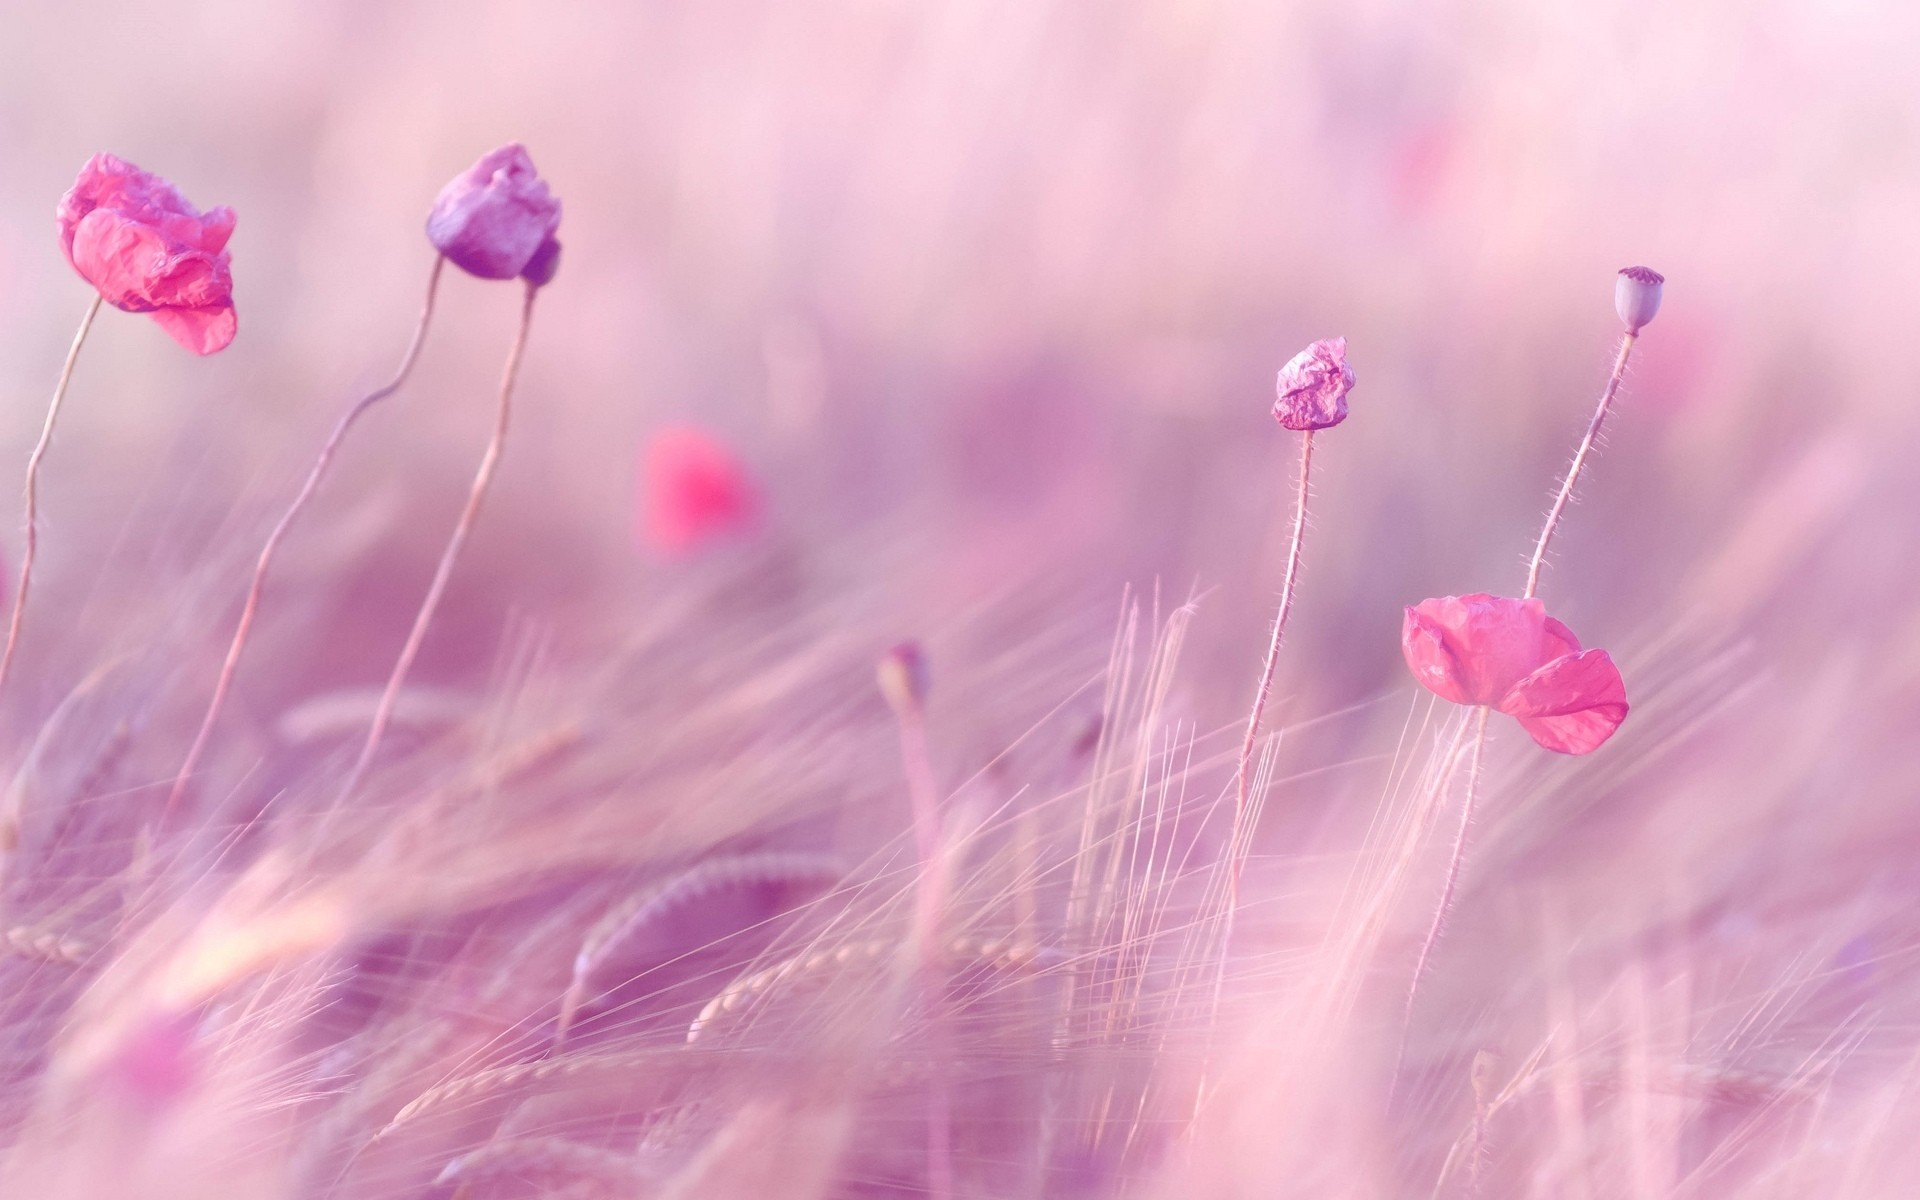 Pink background wallpaper hd